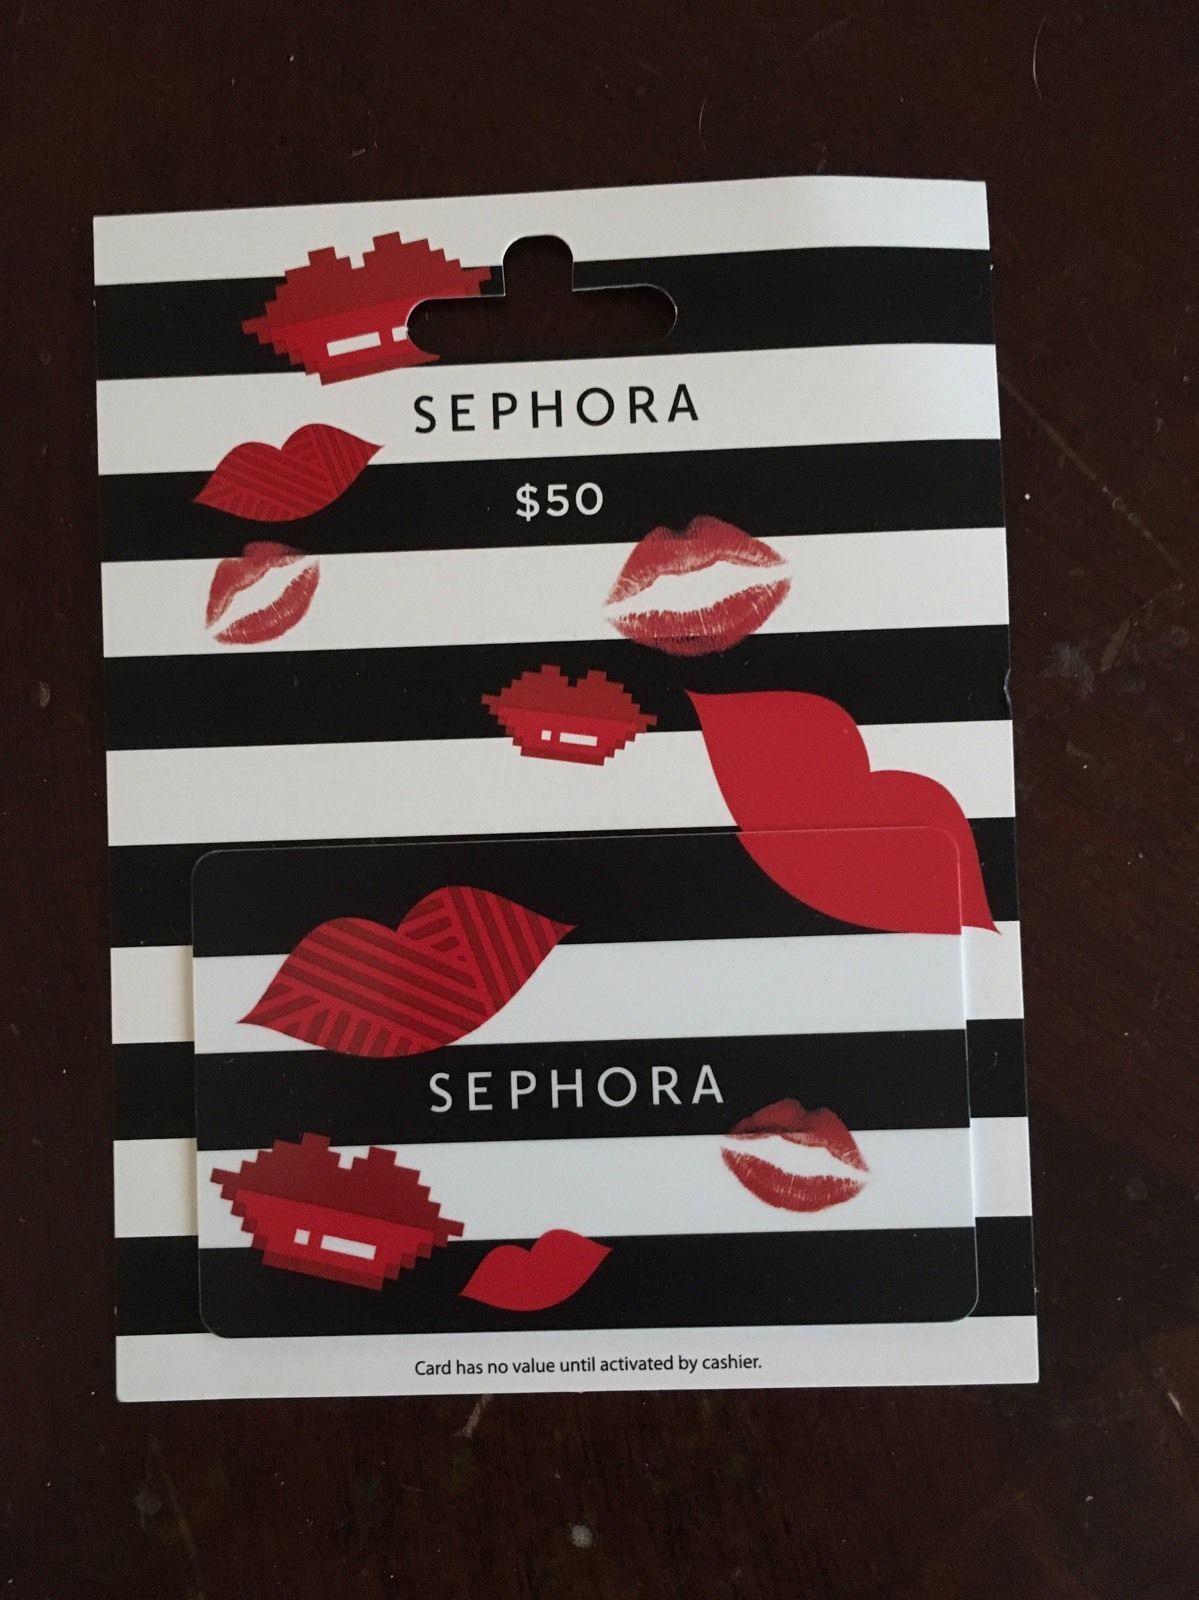 Httpsearchpromocodesubsephora Gift Card Brand New On Backer